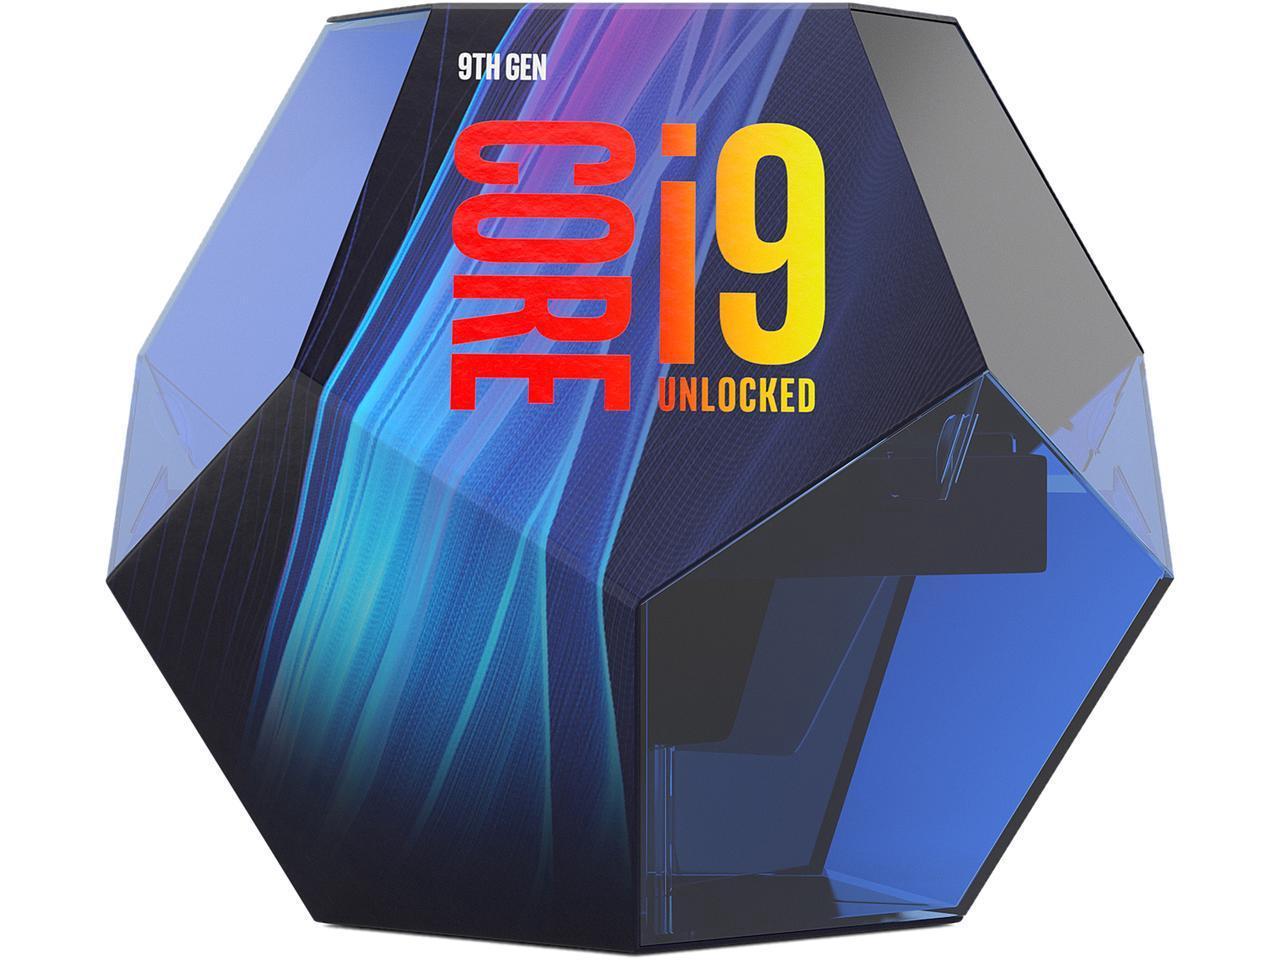 Processeur Intel Core i9-9900K Coffee Lake 8-Core, 16-Thread, 3.6 GHz (5.0 GHz Turbo) LGA 1151 (Frais d'importation inclus)